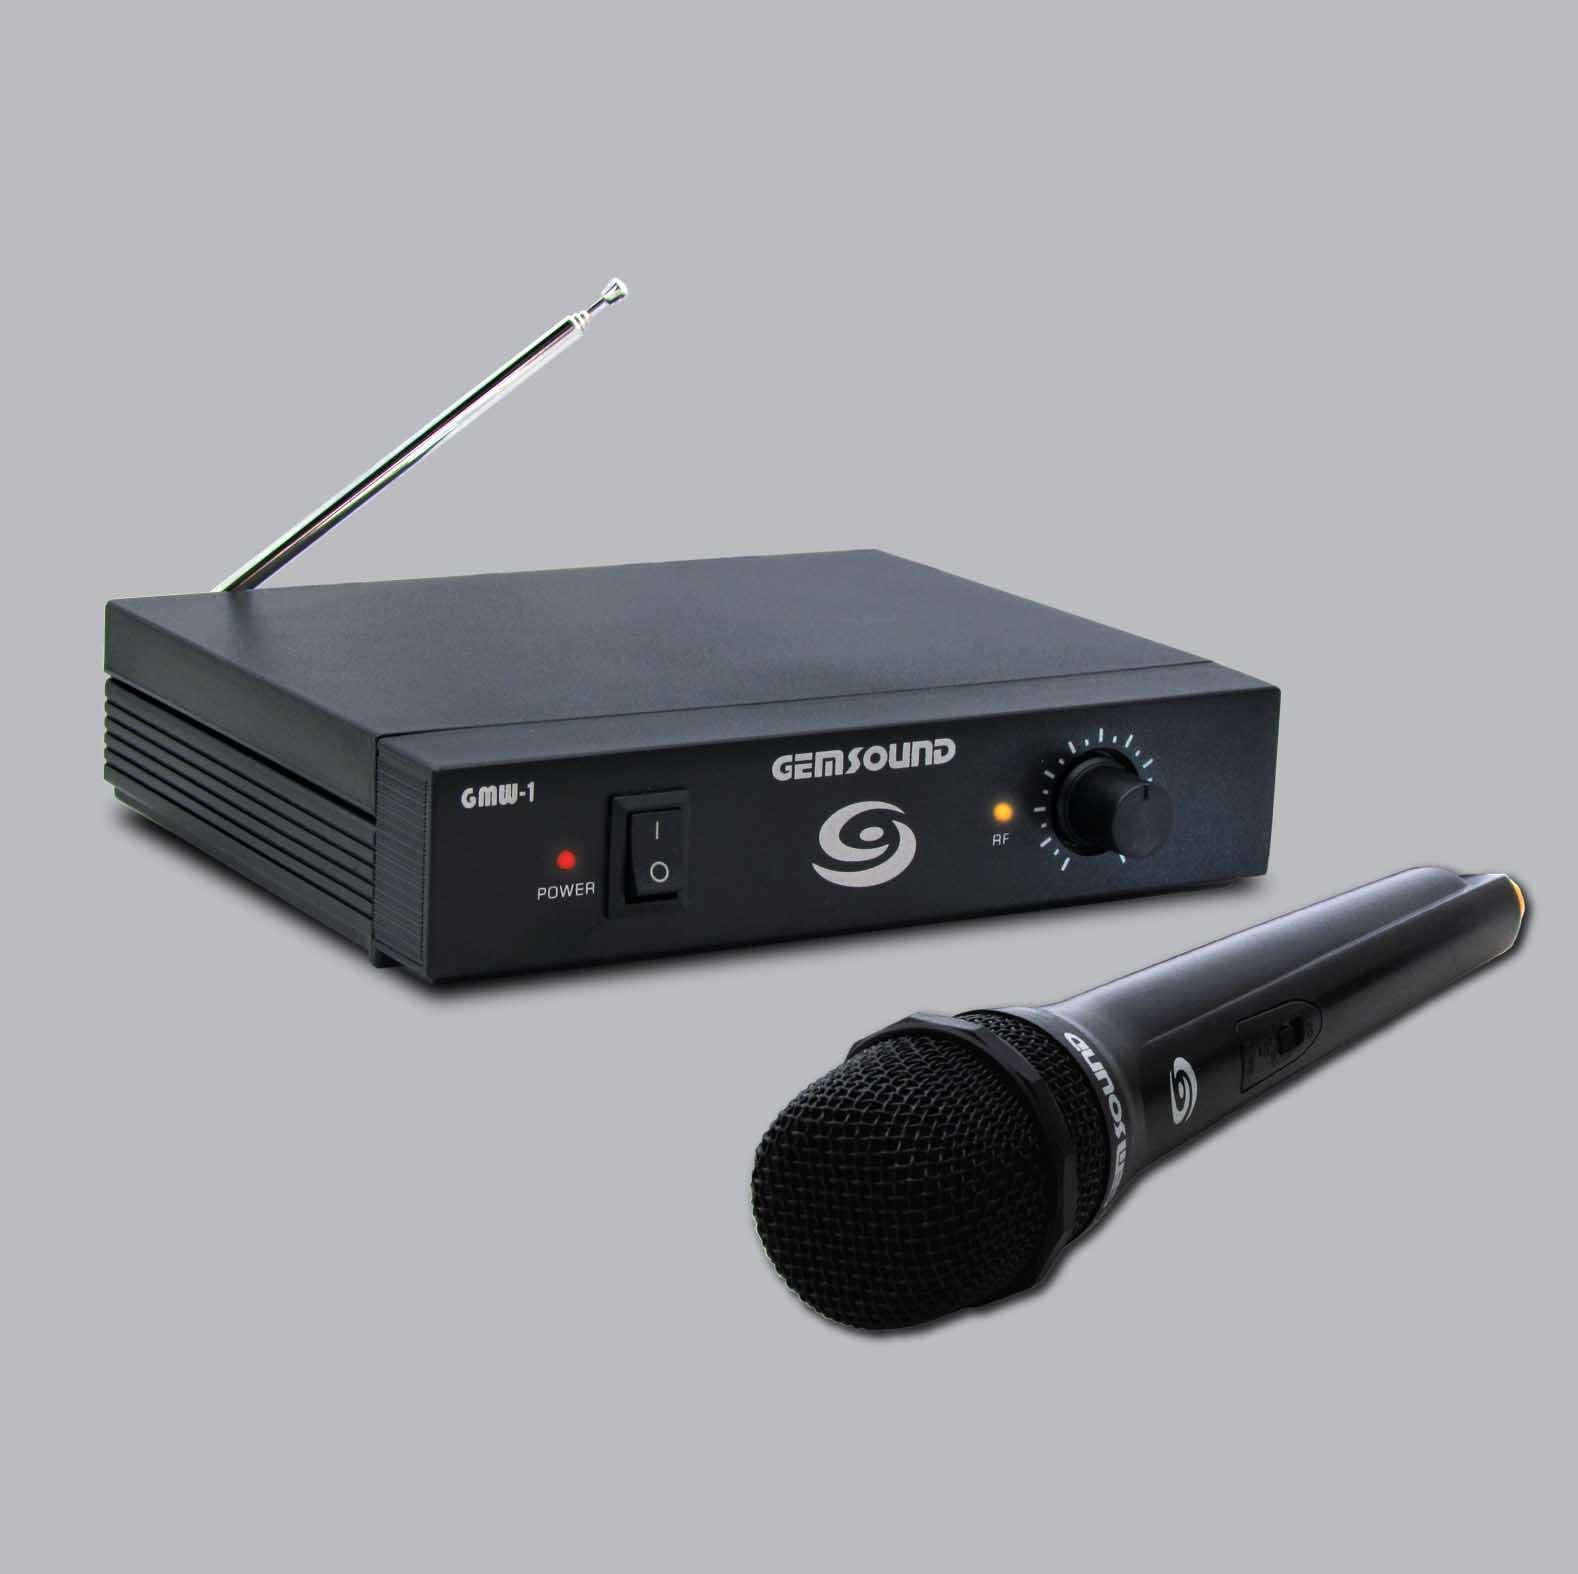 Gem Sound_Home_GMW1.jpg